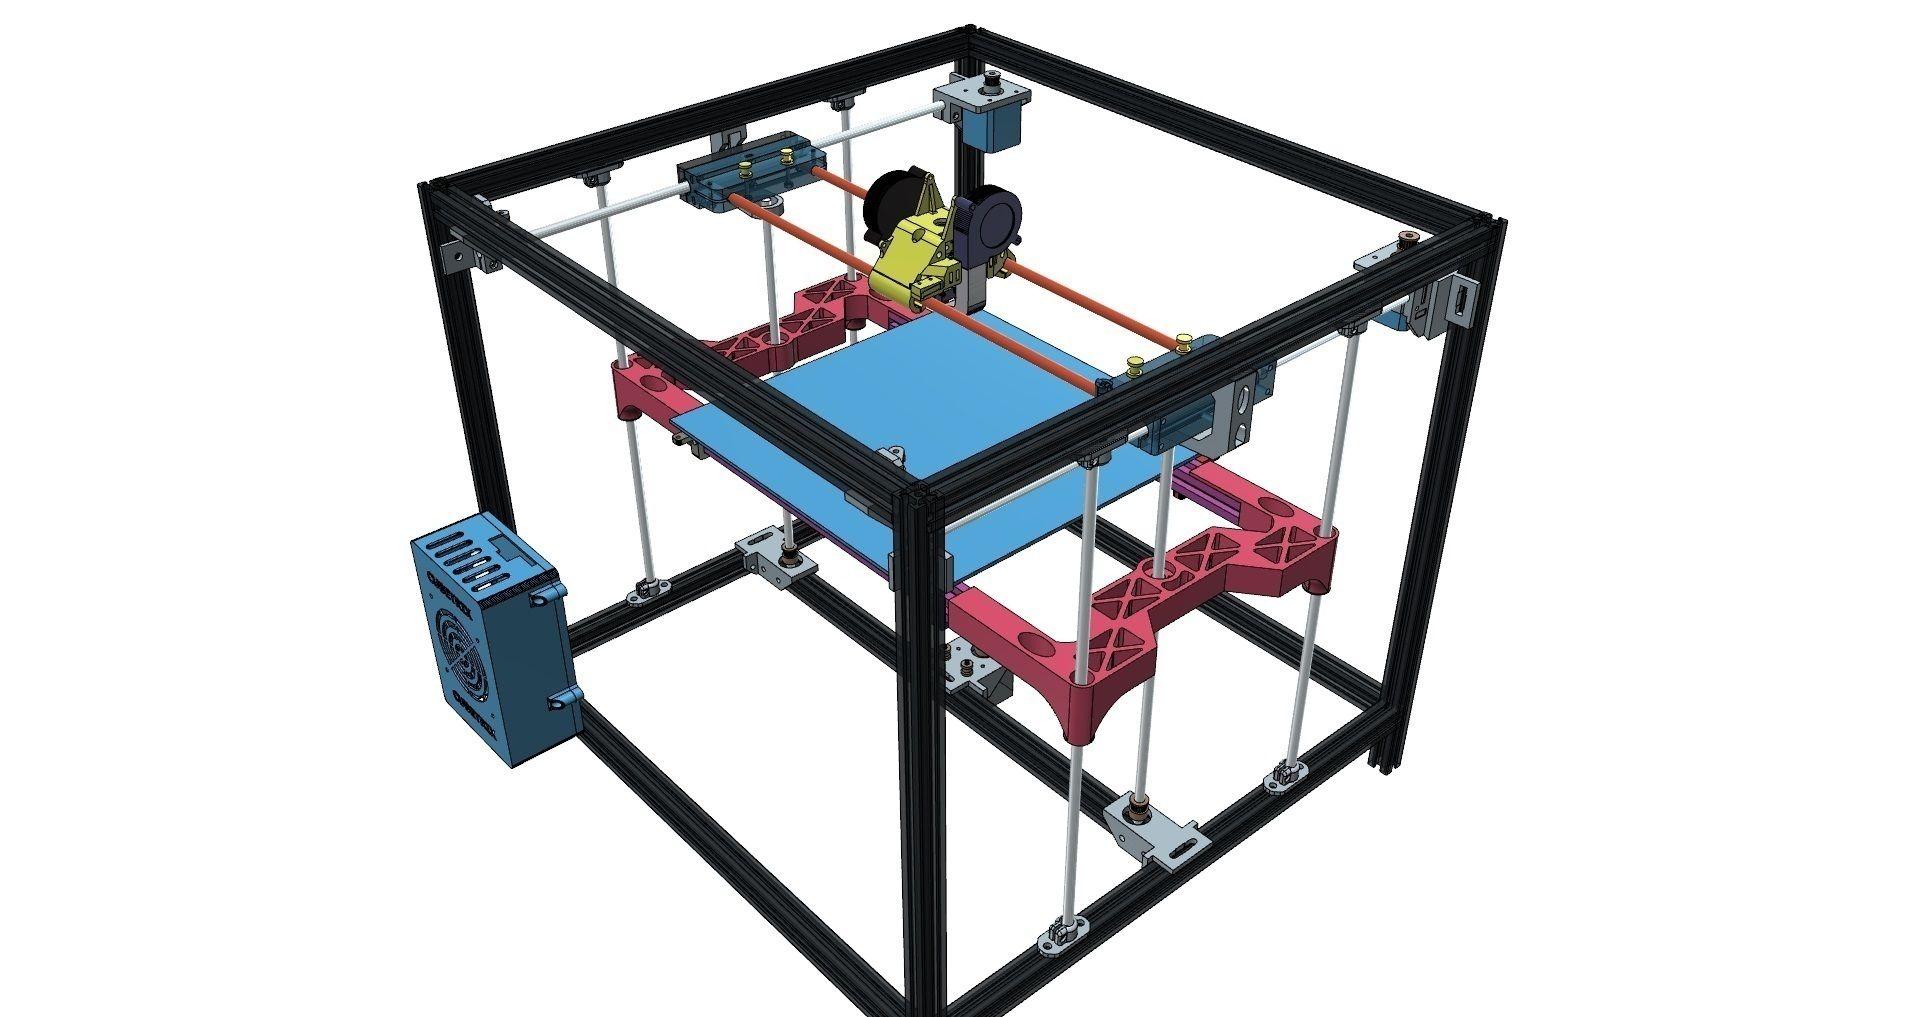 3D Printed CUBETRIX diy corexy 3D PRINTER by ion_gurguta